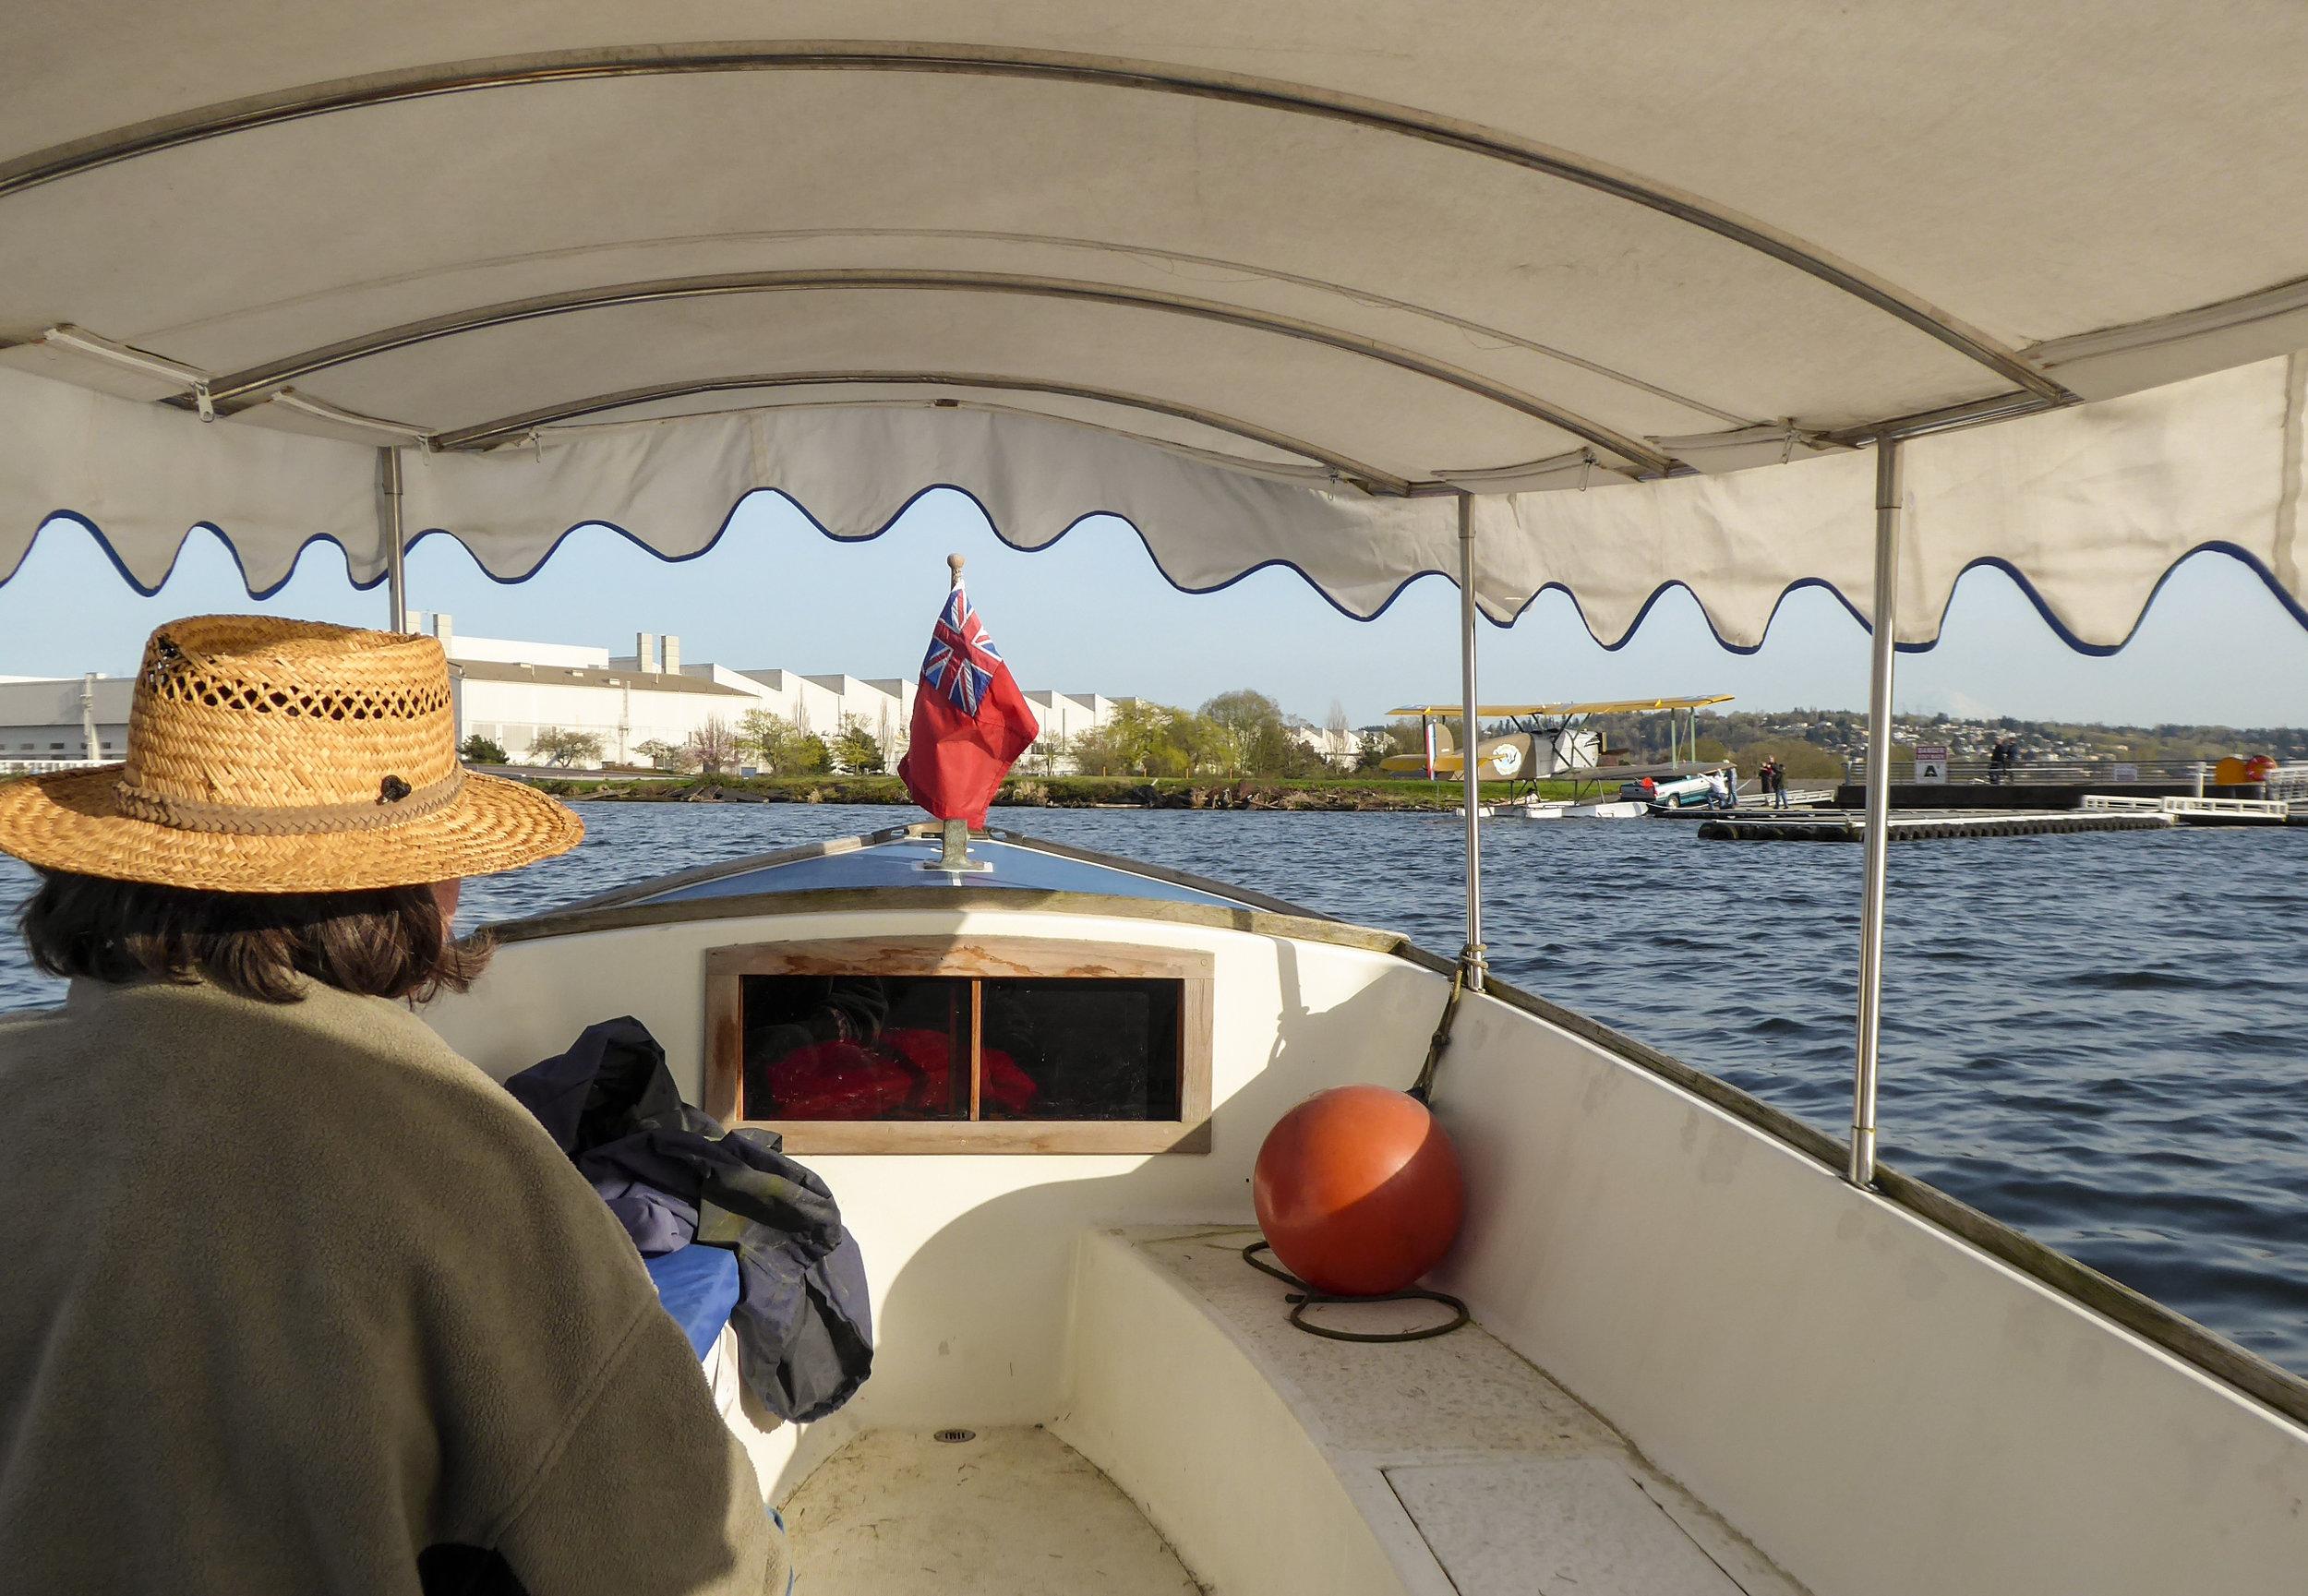 Navigator Joellen keeps them headed for the Renton seaplane dock.